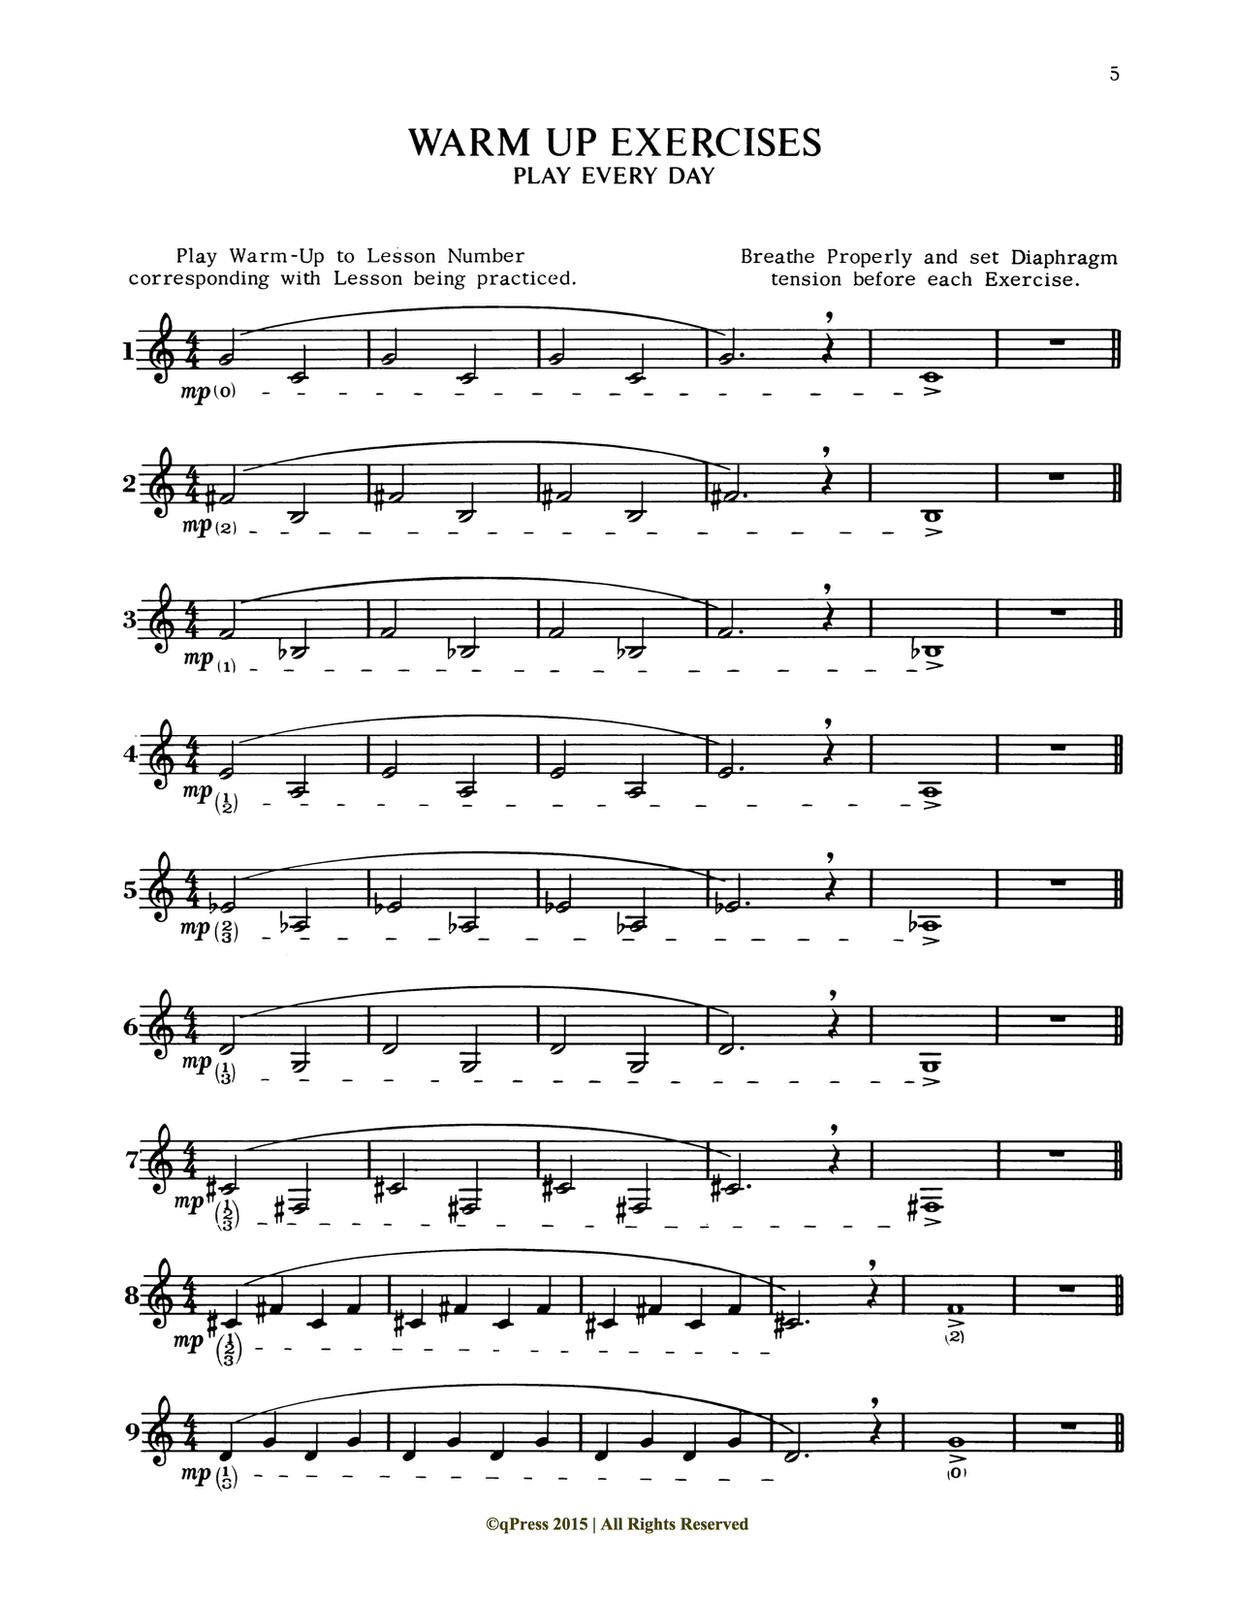 Brisbois, Trumpet Today, Building the Upper Register 4